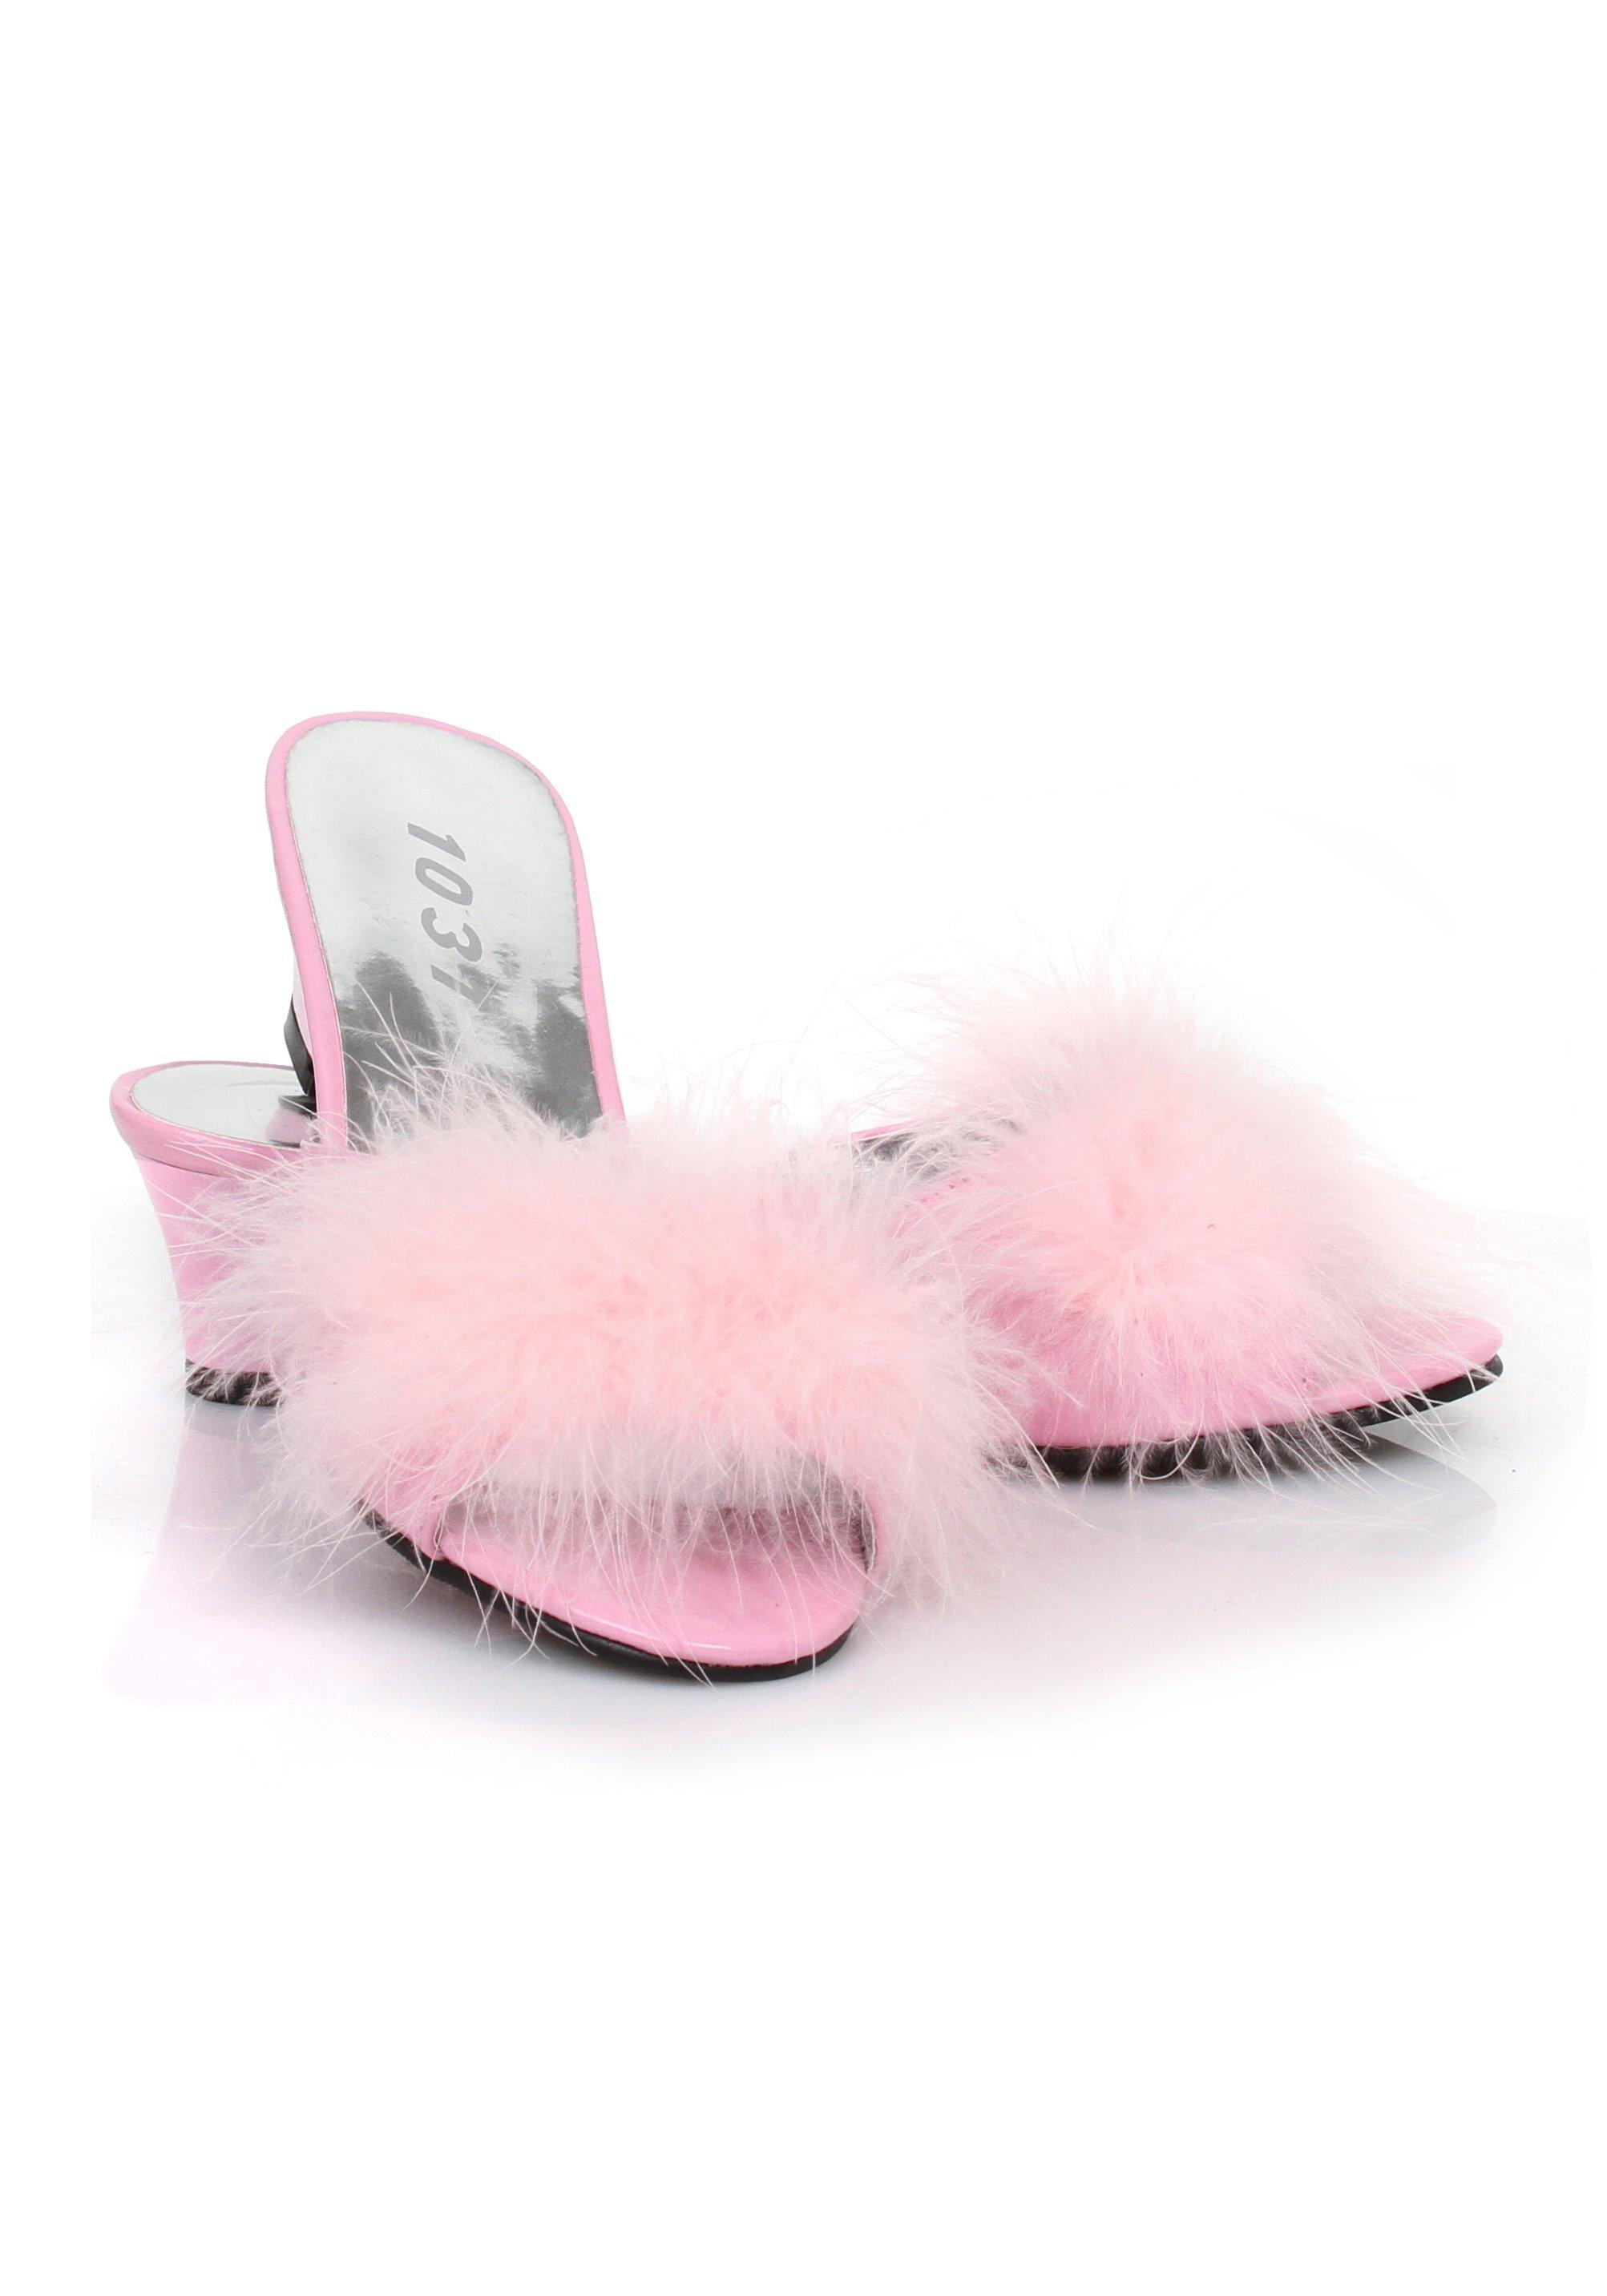 b6189cba805 Ellie Shoes PHOEBE 2.5 Inch Heel Satin Marabou Slippers Women S Size ...